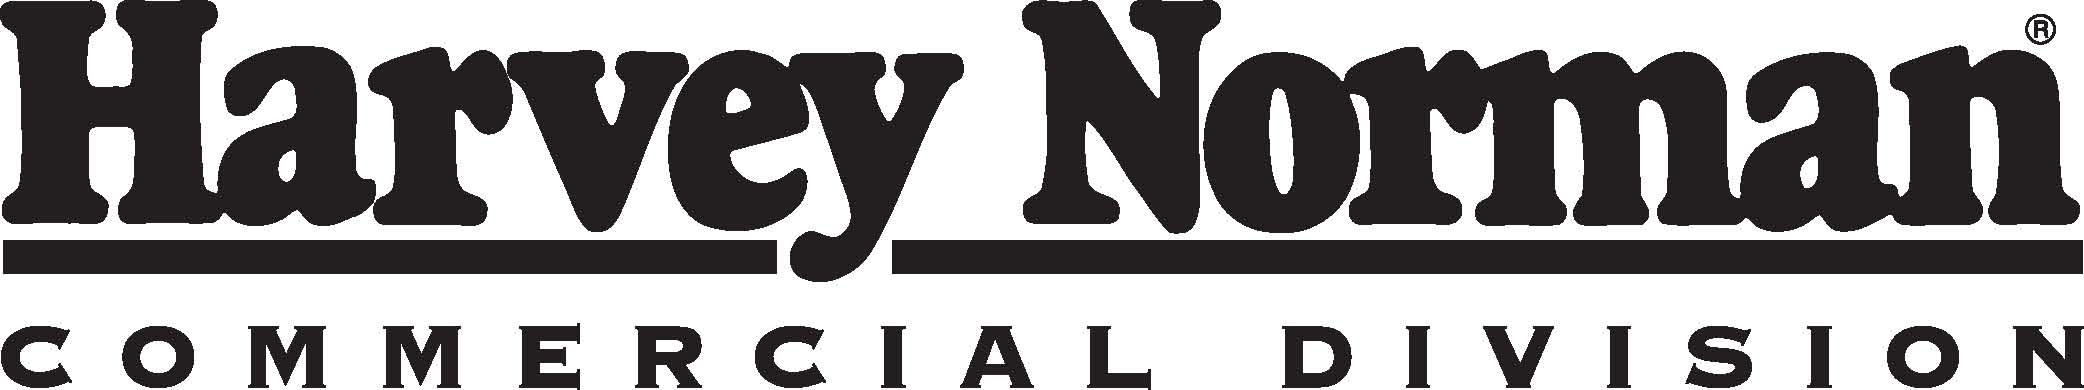 HN logo black.pdf high res